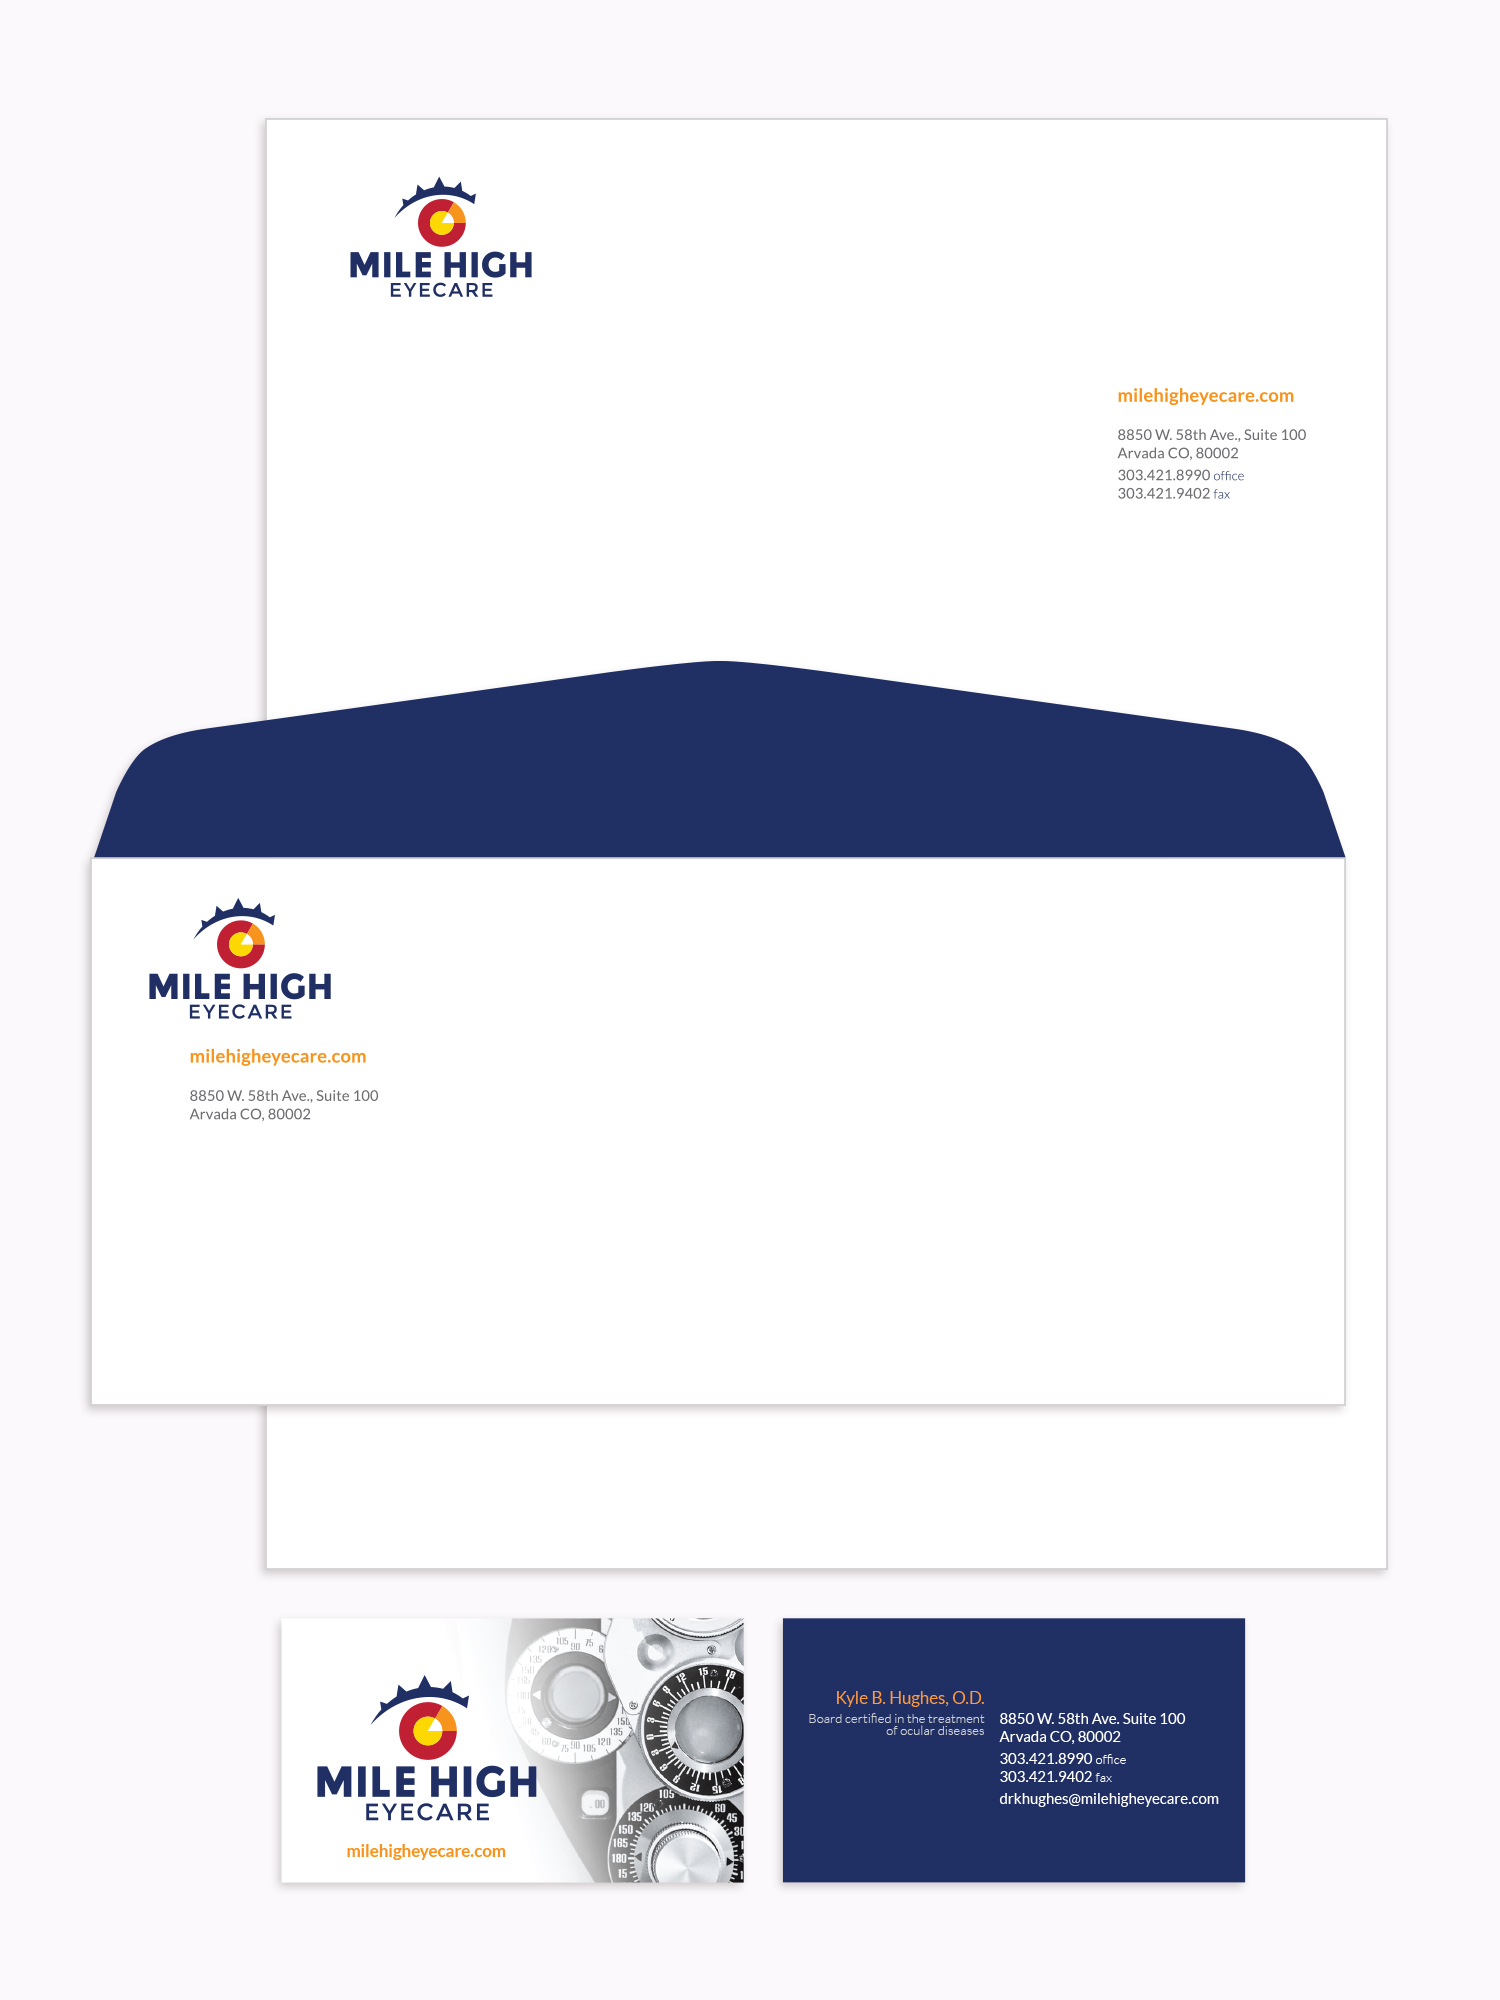 MHEC-letterhead.jpg